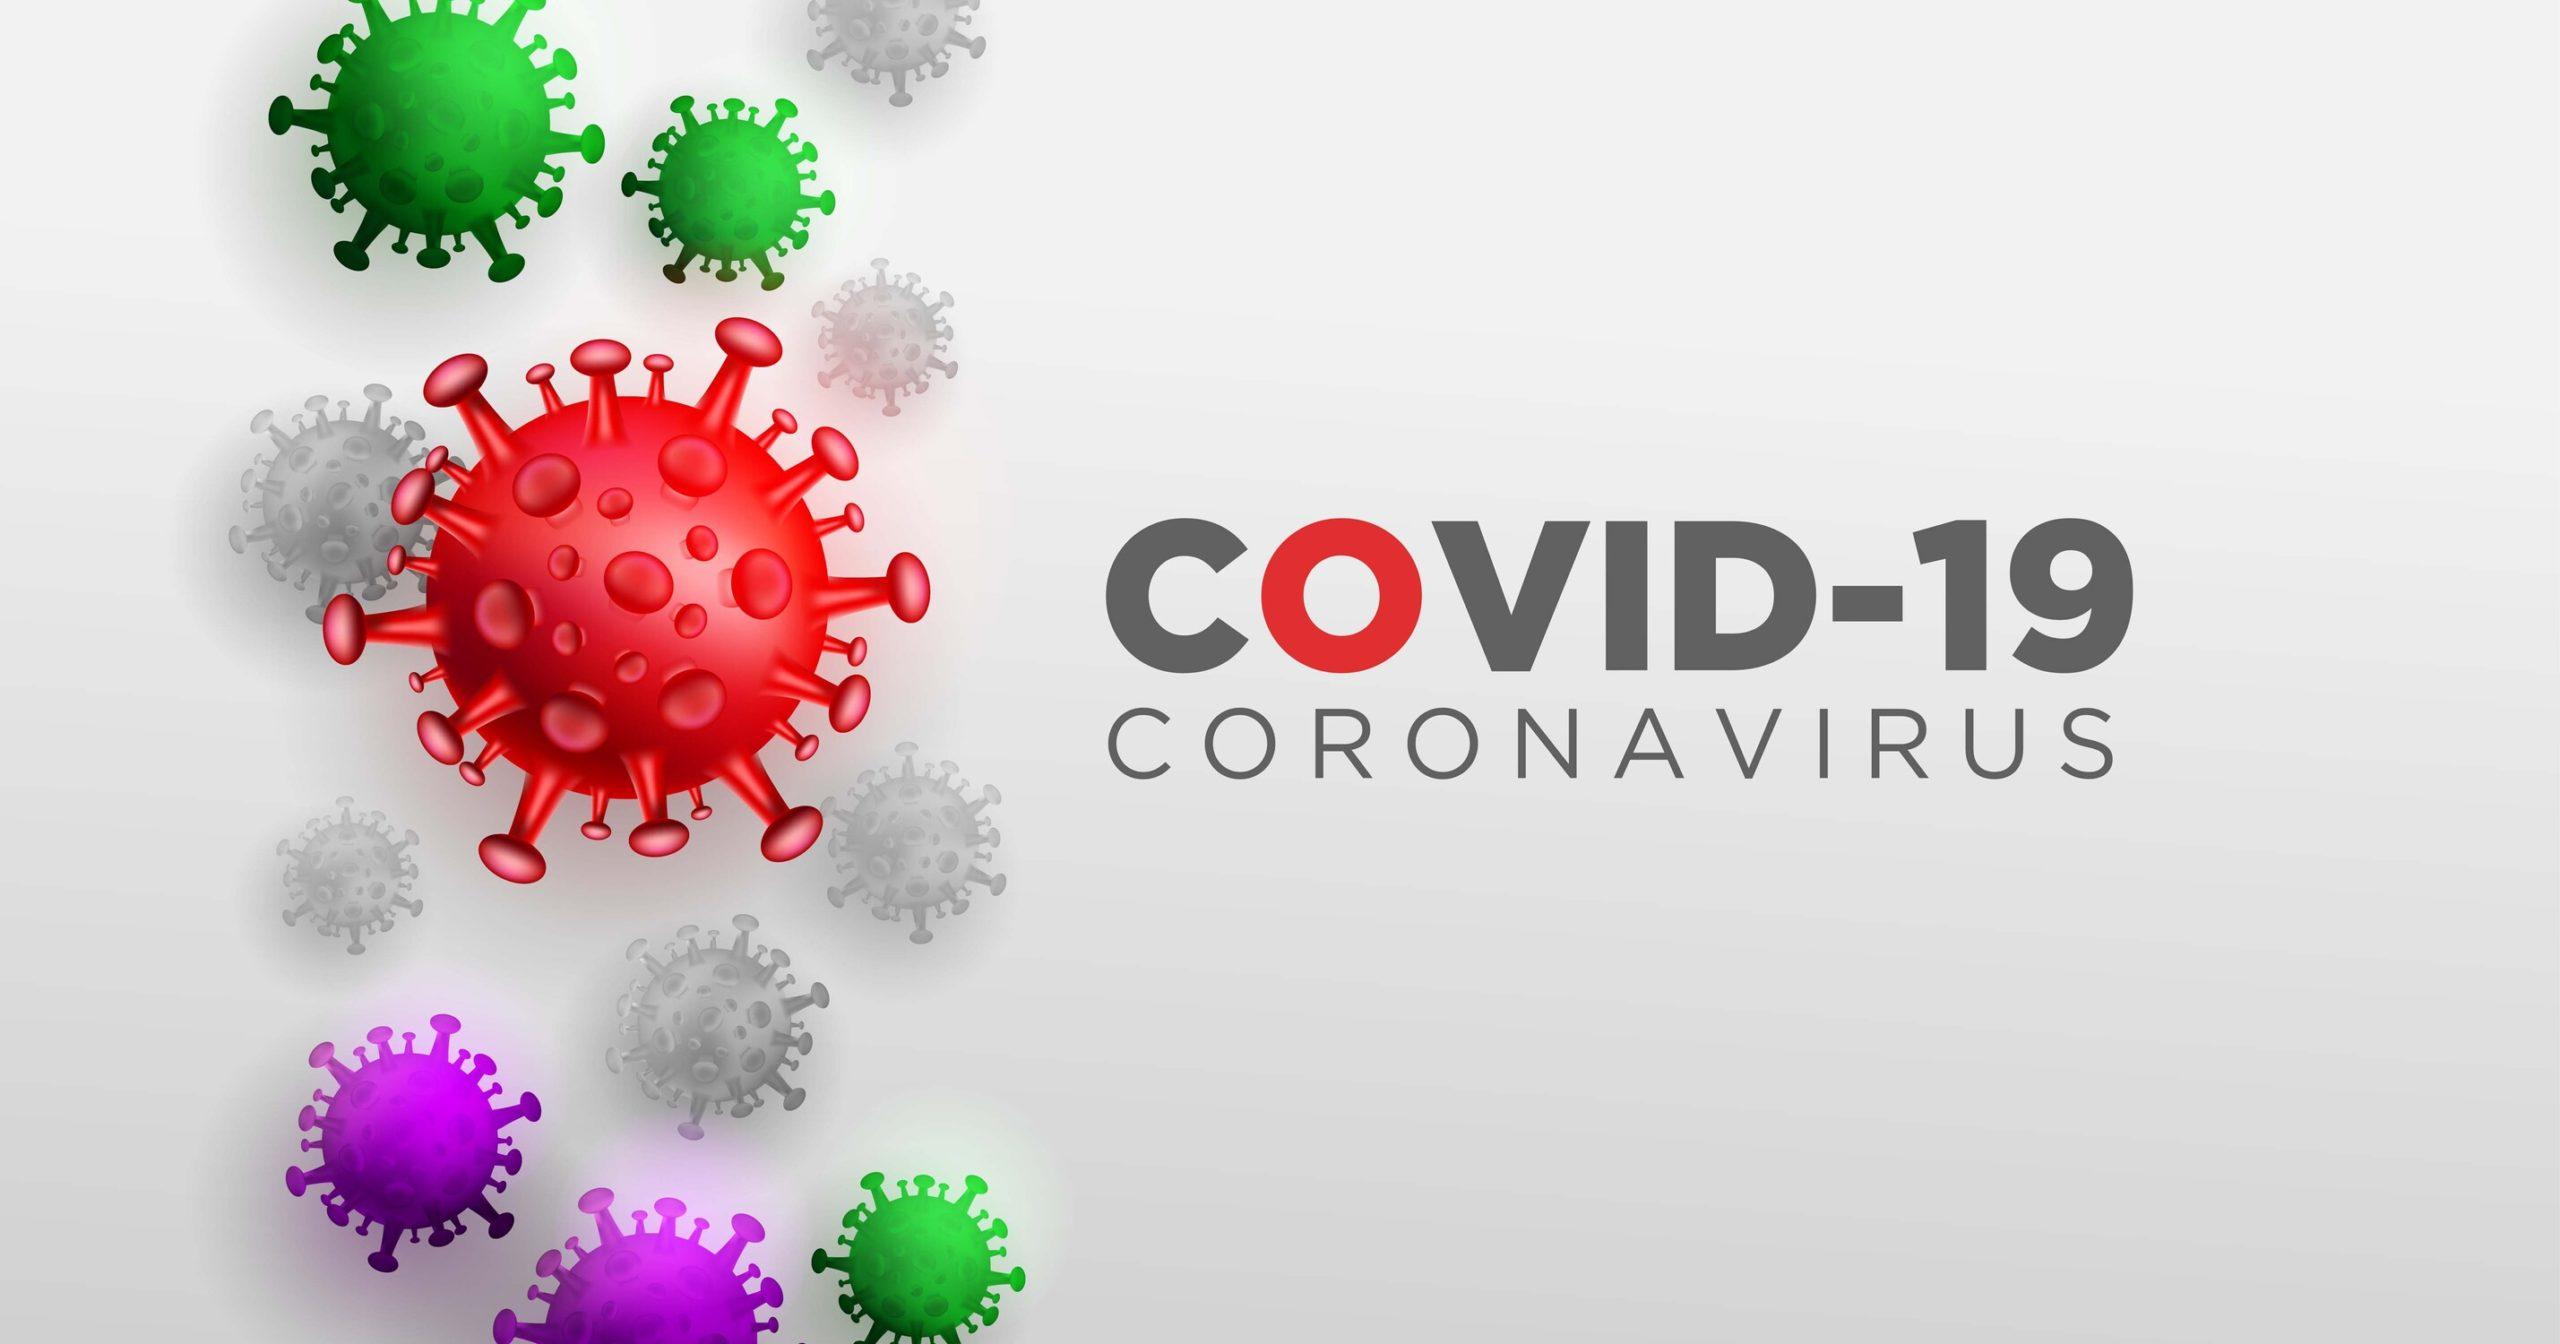 Cara penyebaran corona virus - Dampak Corona Bagi Ekonomi Indonesia